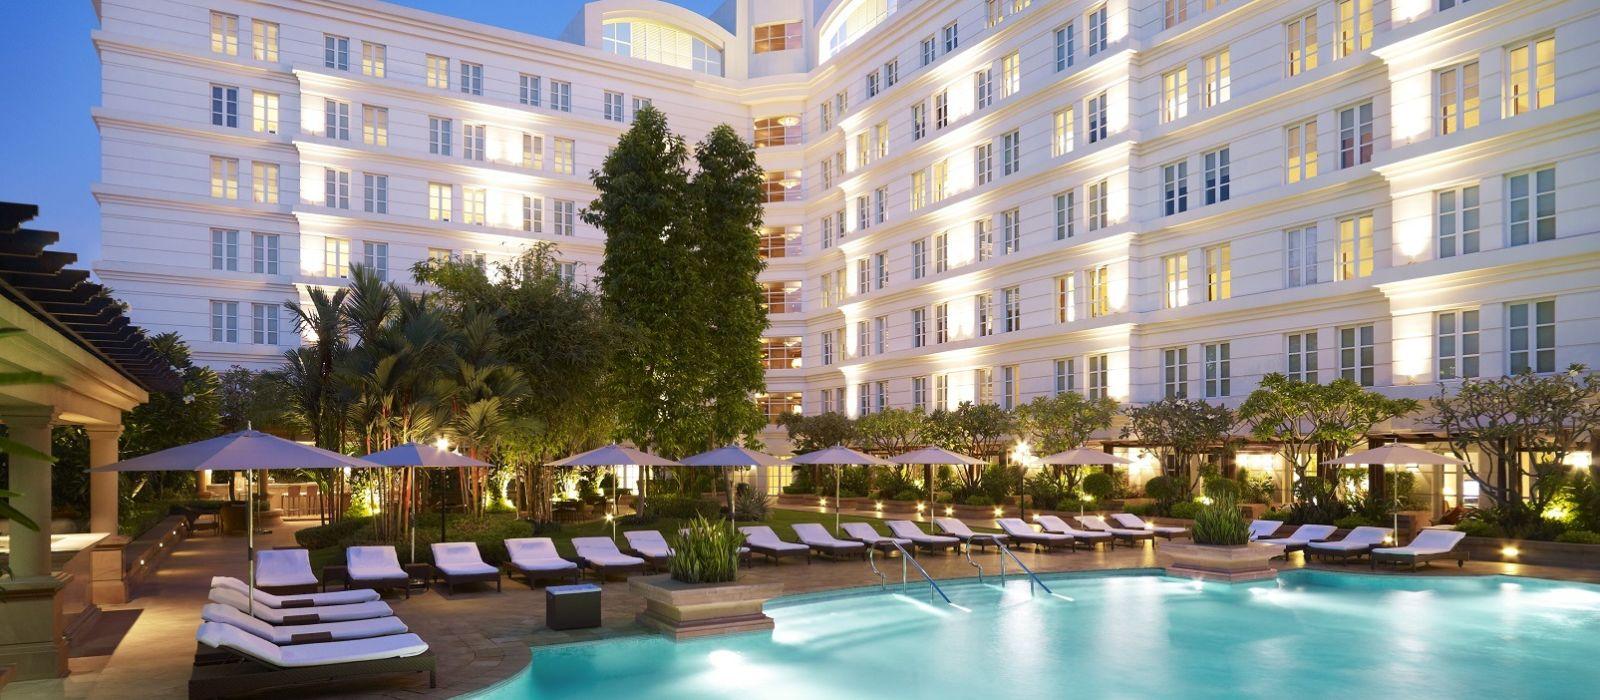 Hotel Park Hyatt Saigon Vietnam